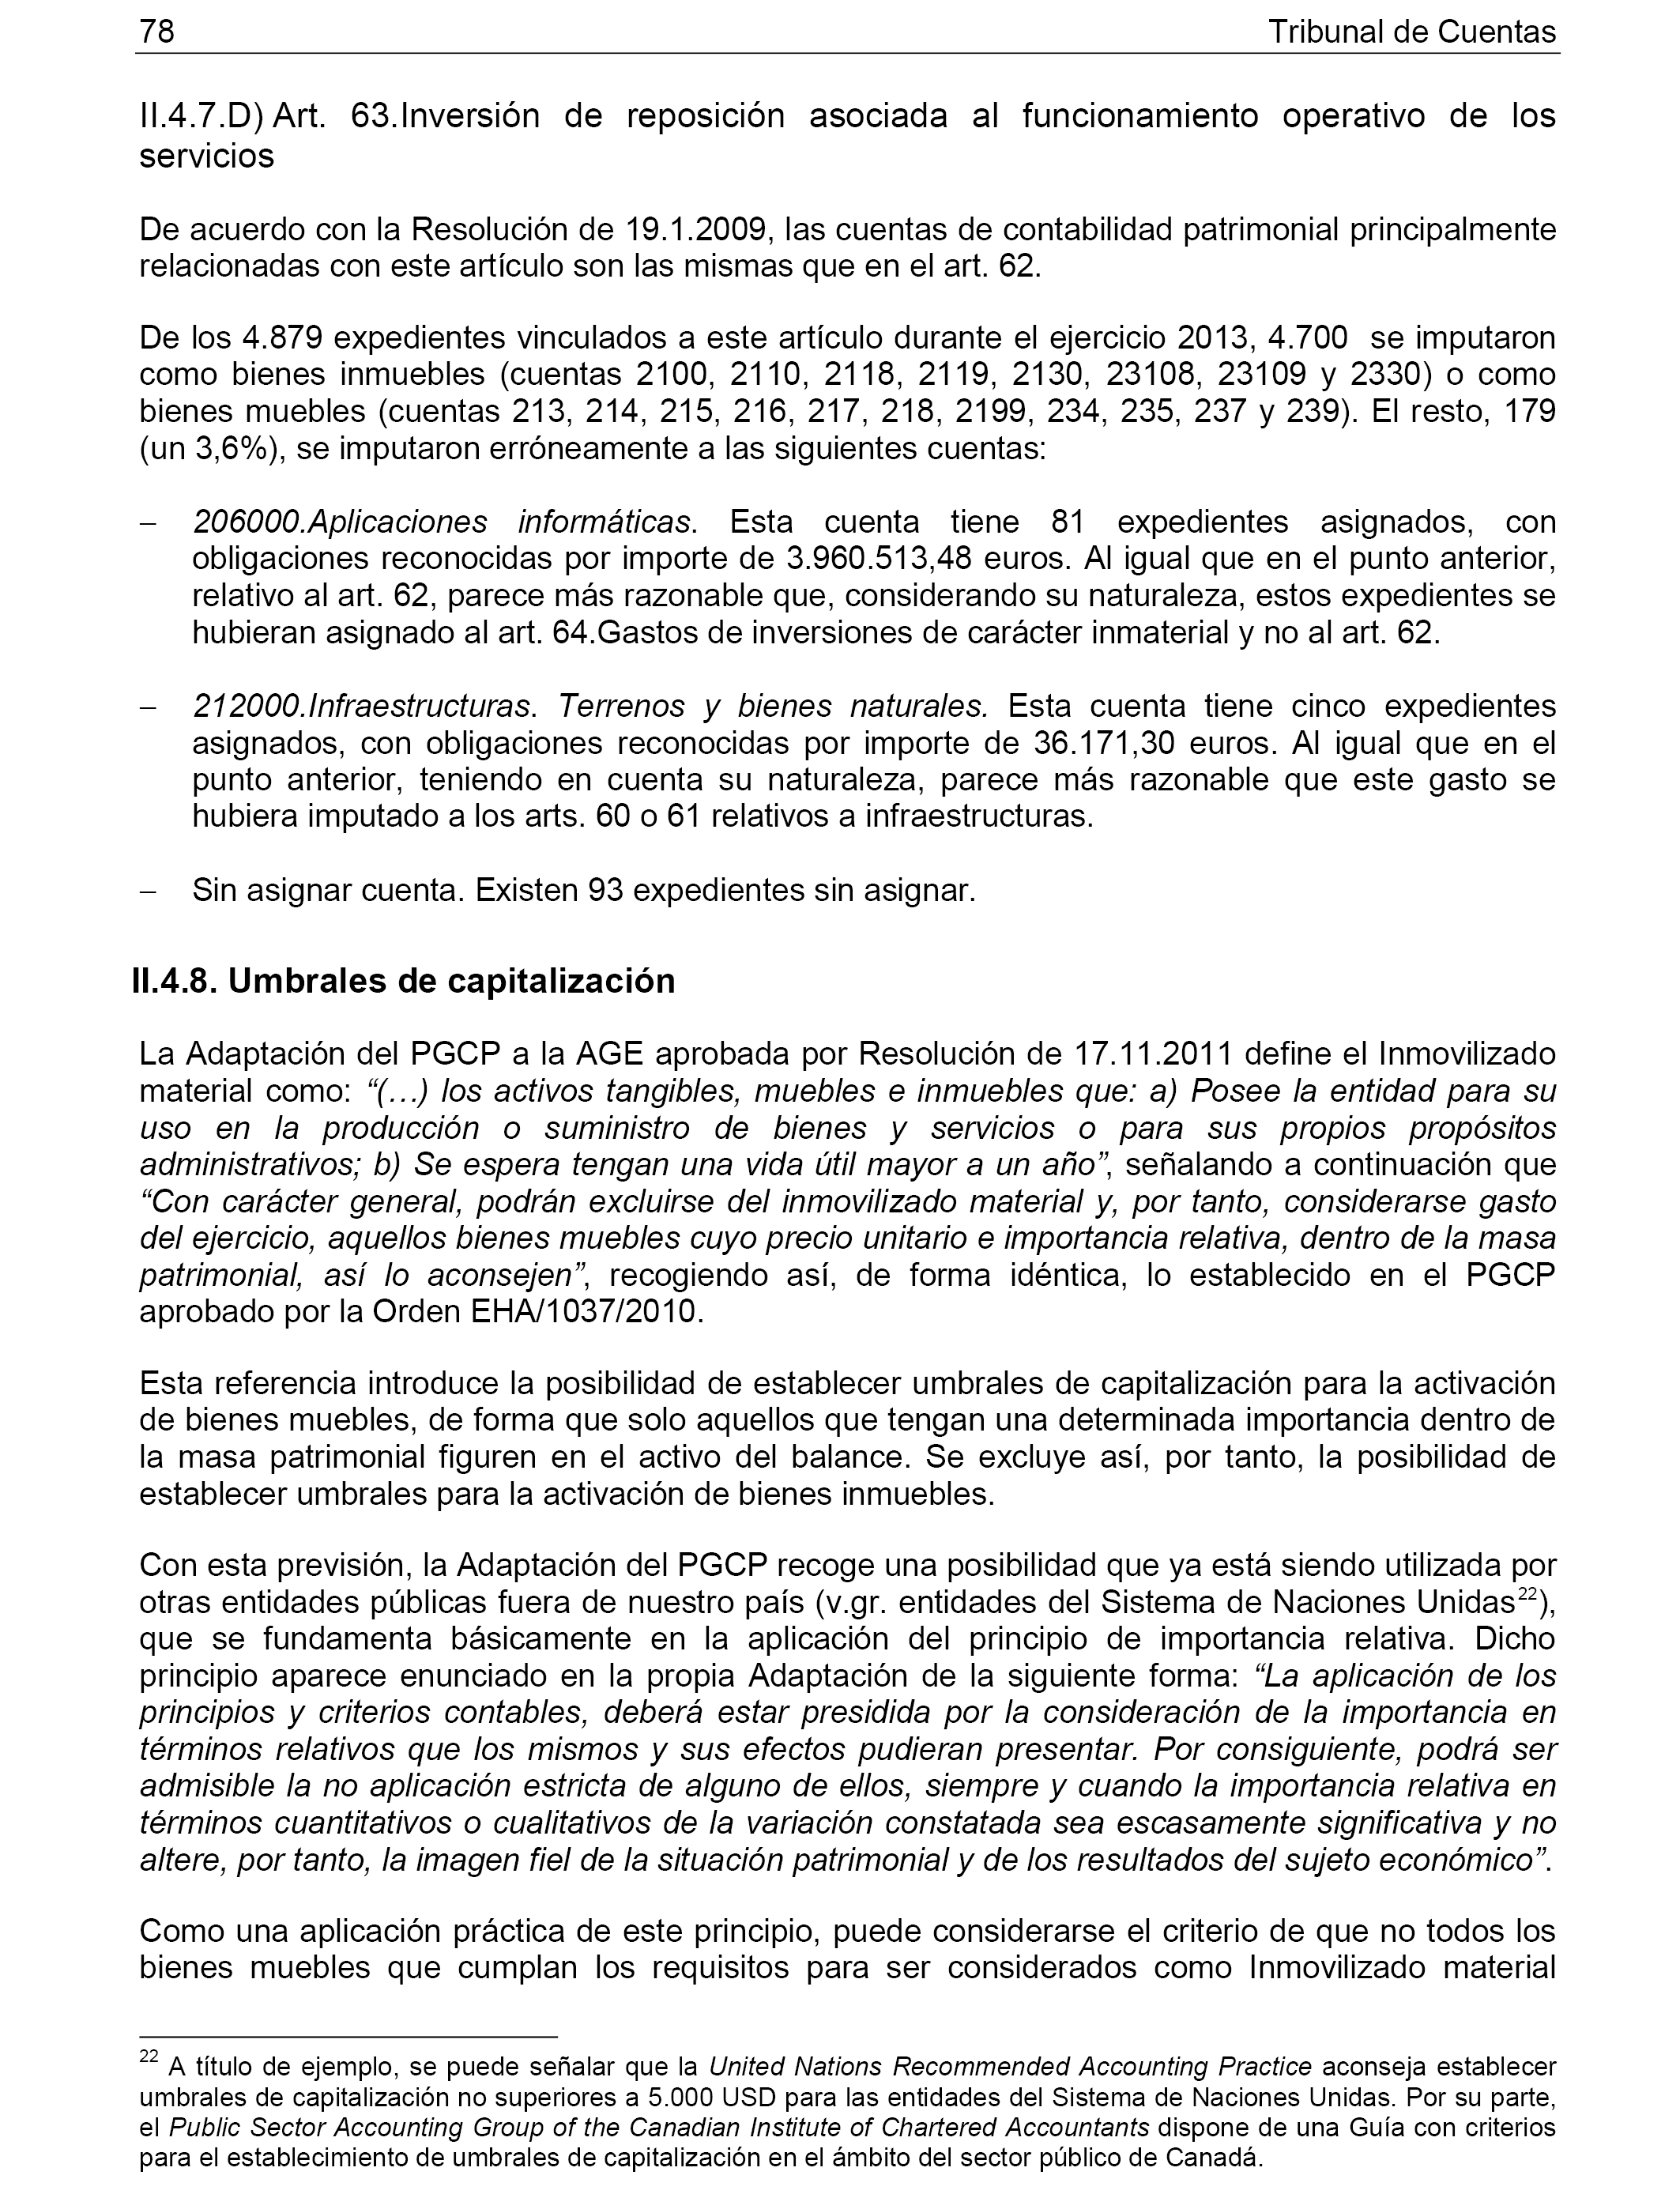 BOE.es - Documento BOE-A-2017-8709